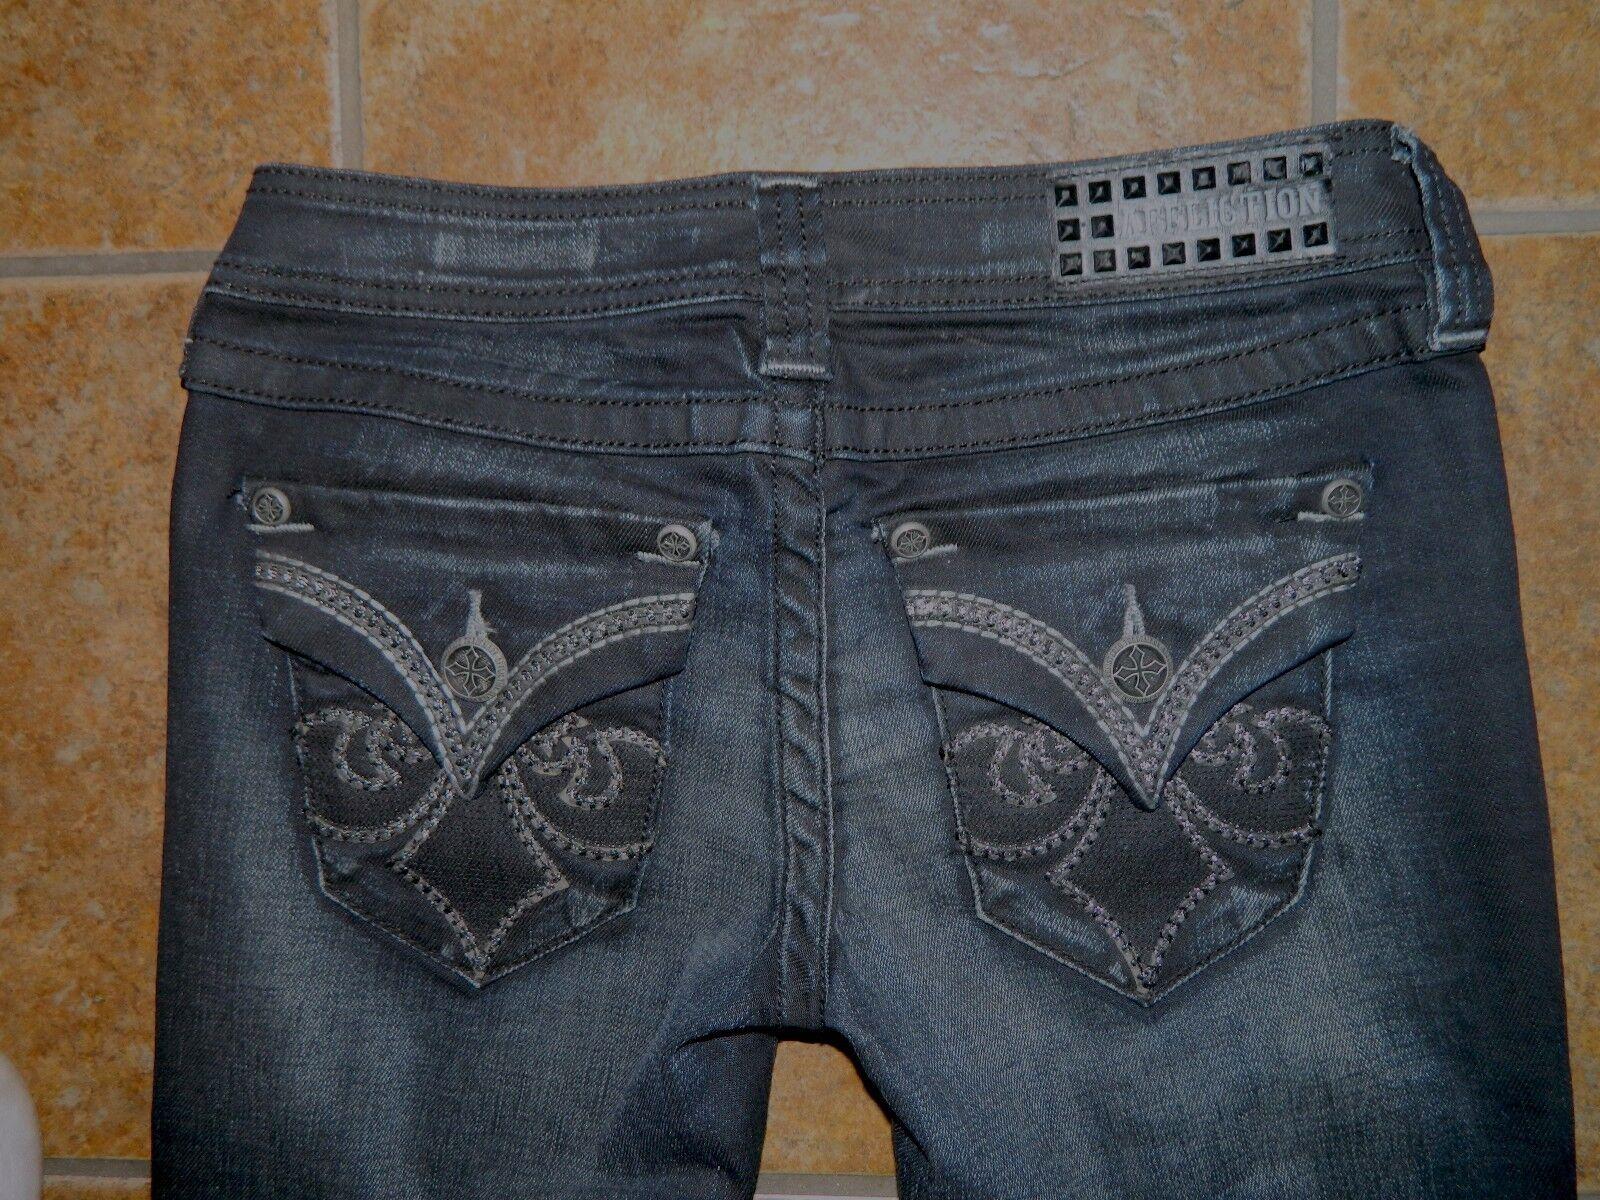 NWT Blk Affliction Fleur De Lis Boot Cut Metallic Embroidered Jeans Sz 26 MSRP